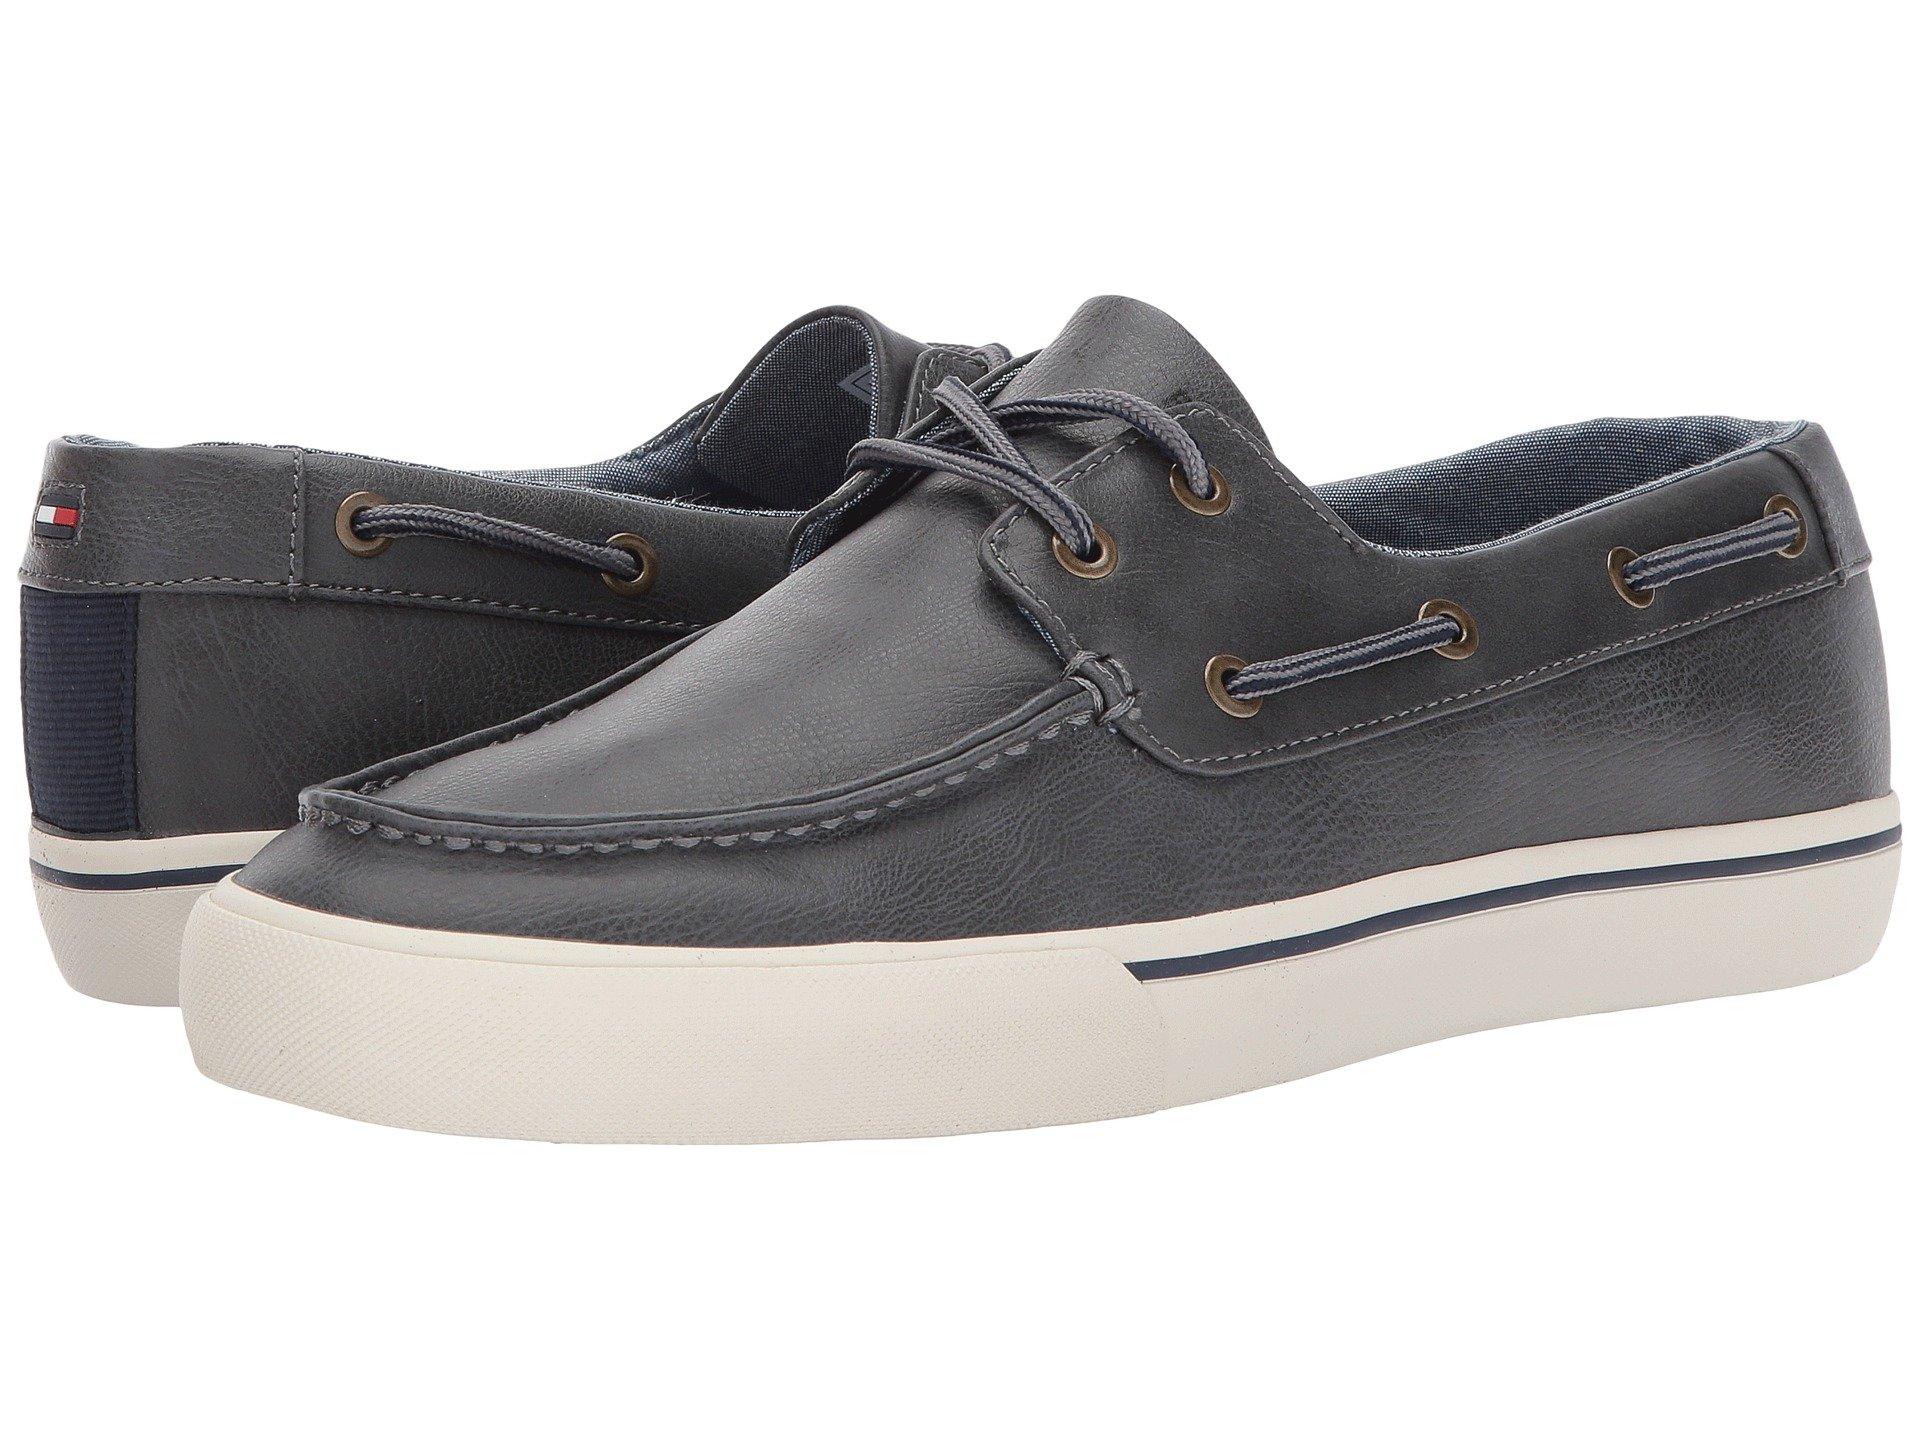 Calzado Tipo Boat Shoe para Hombre Tommy Hilfiger Pharis2  + Tommy Hilfiger en VeoyCompro.net